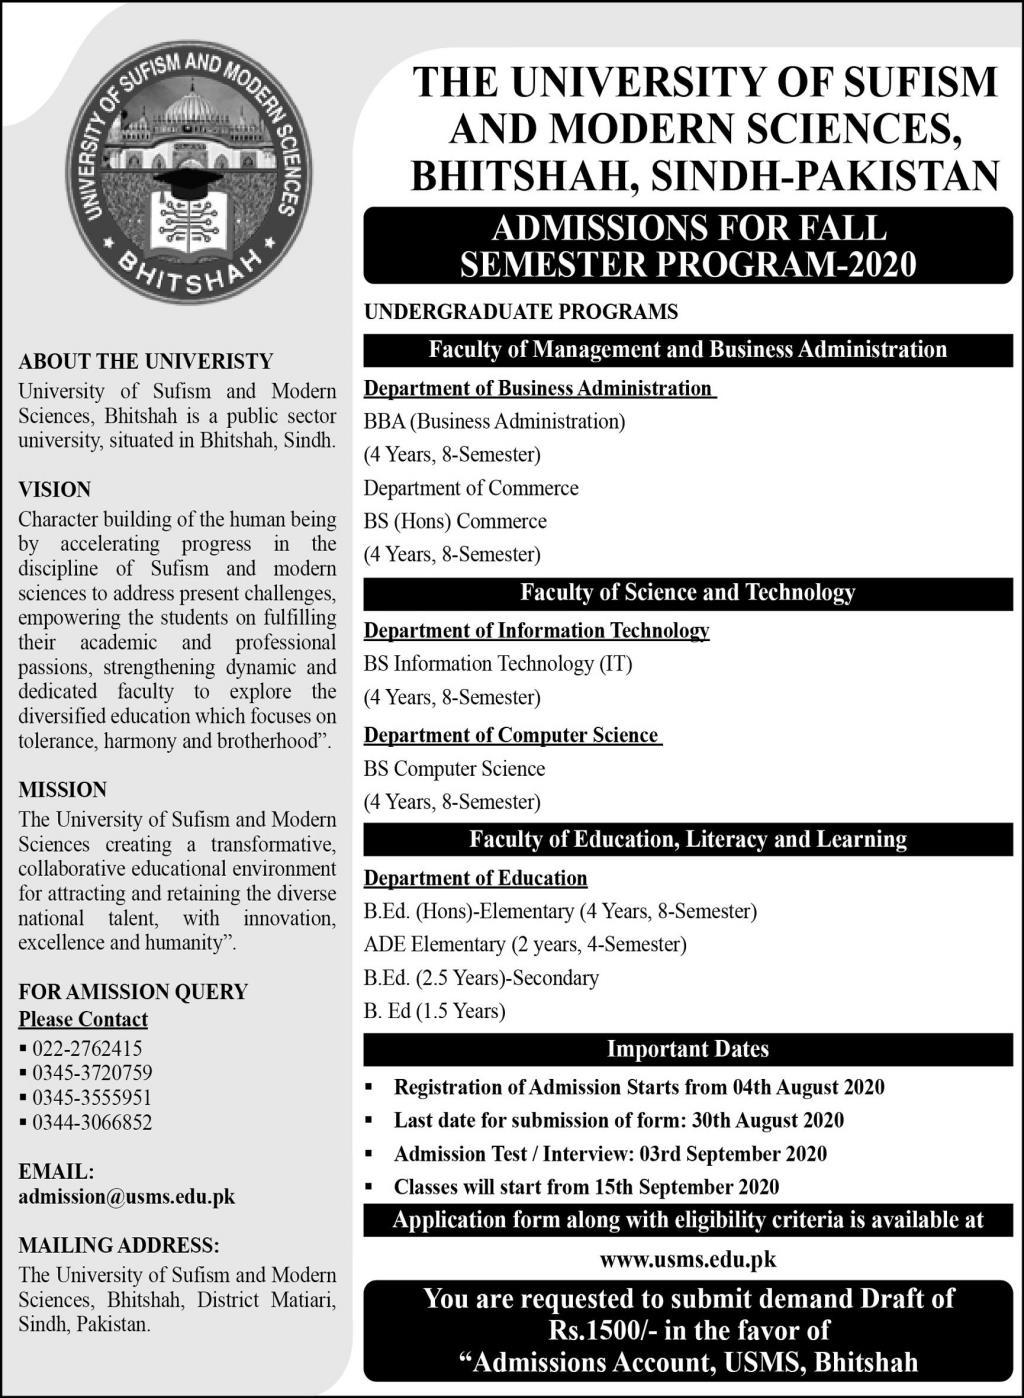 University Of Sufism & Modern Sciences Bhitshah Admissions